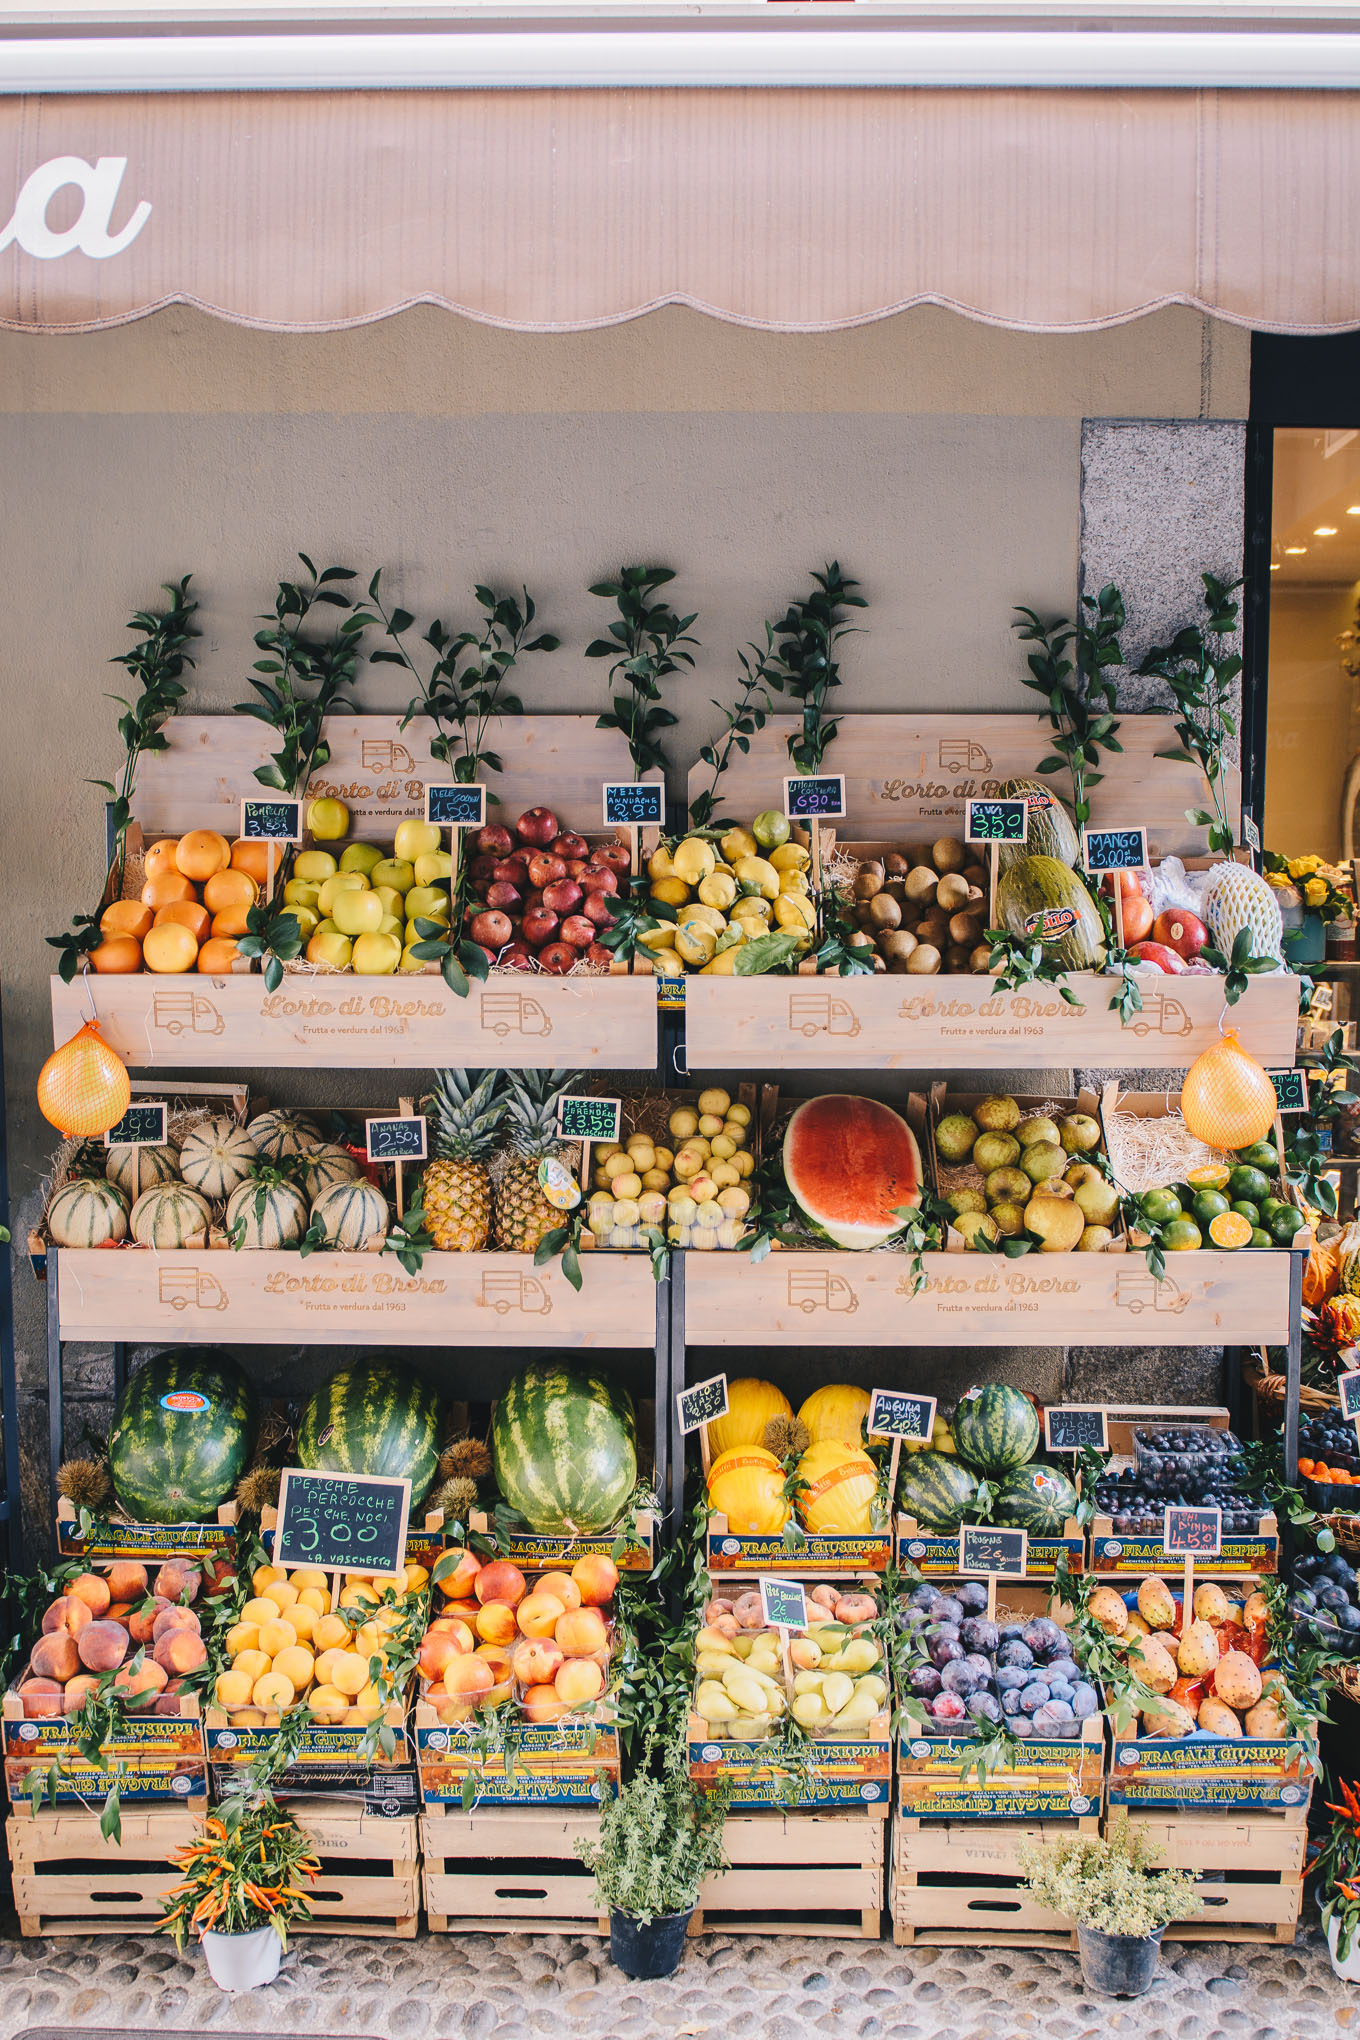 Milan produce market